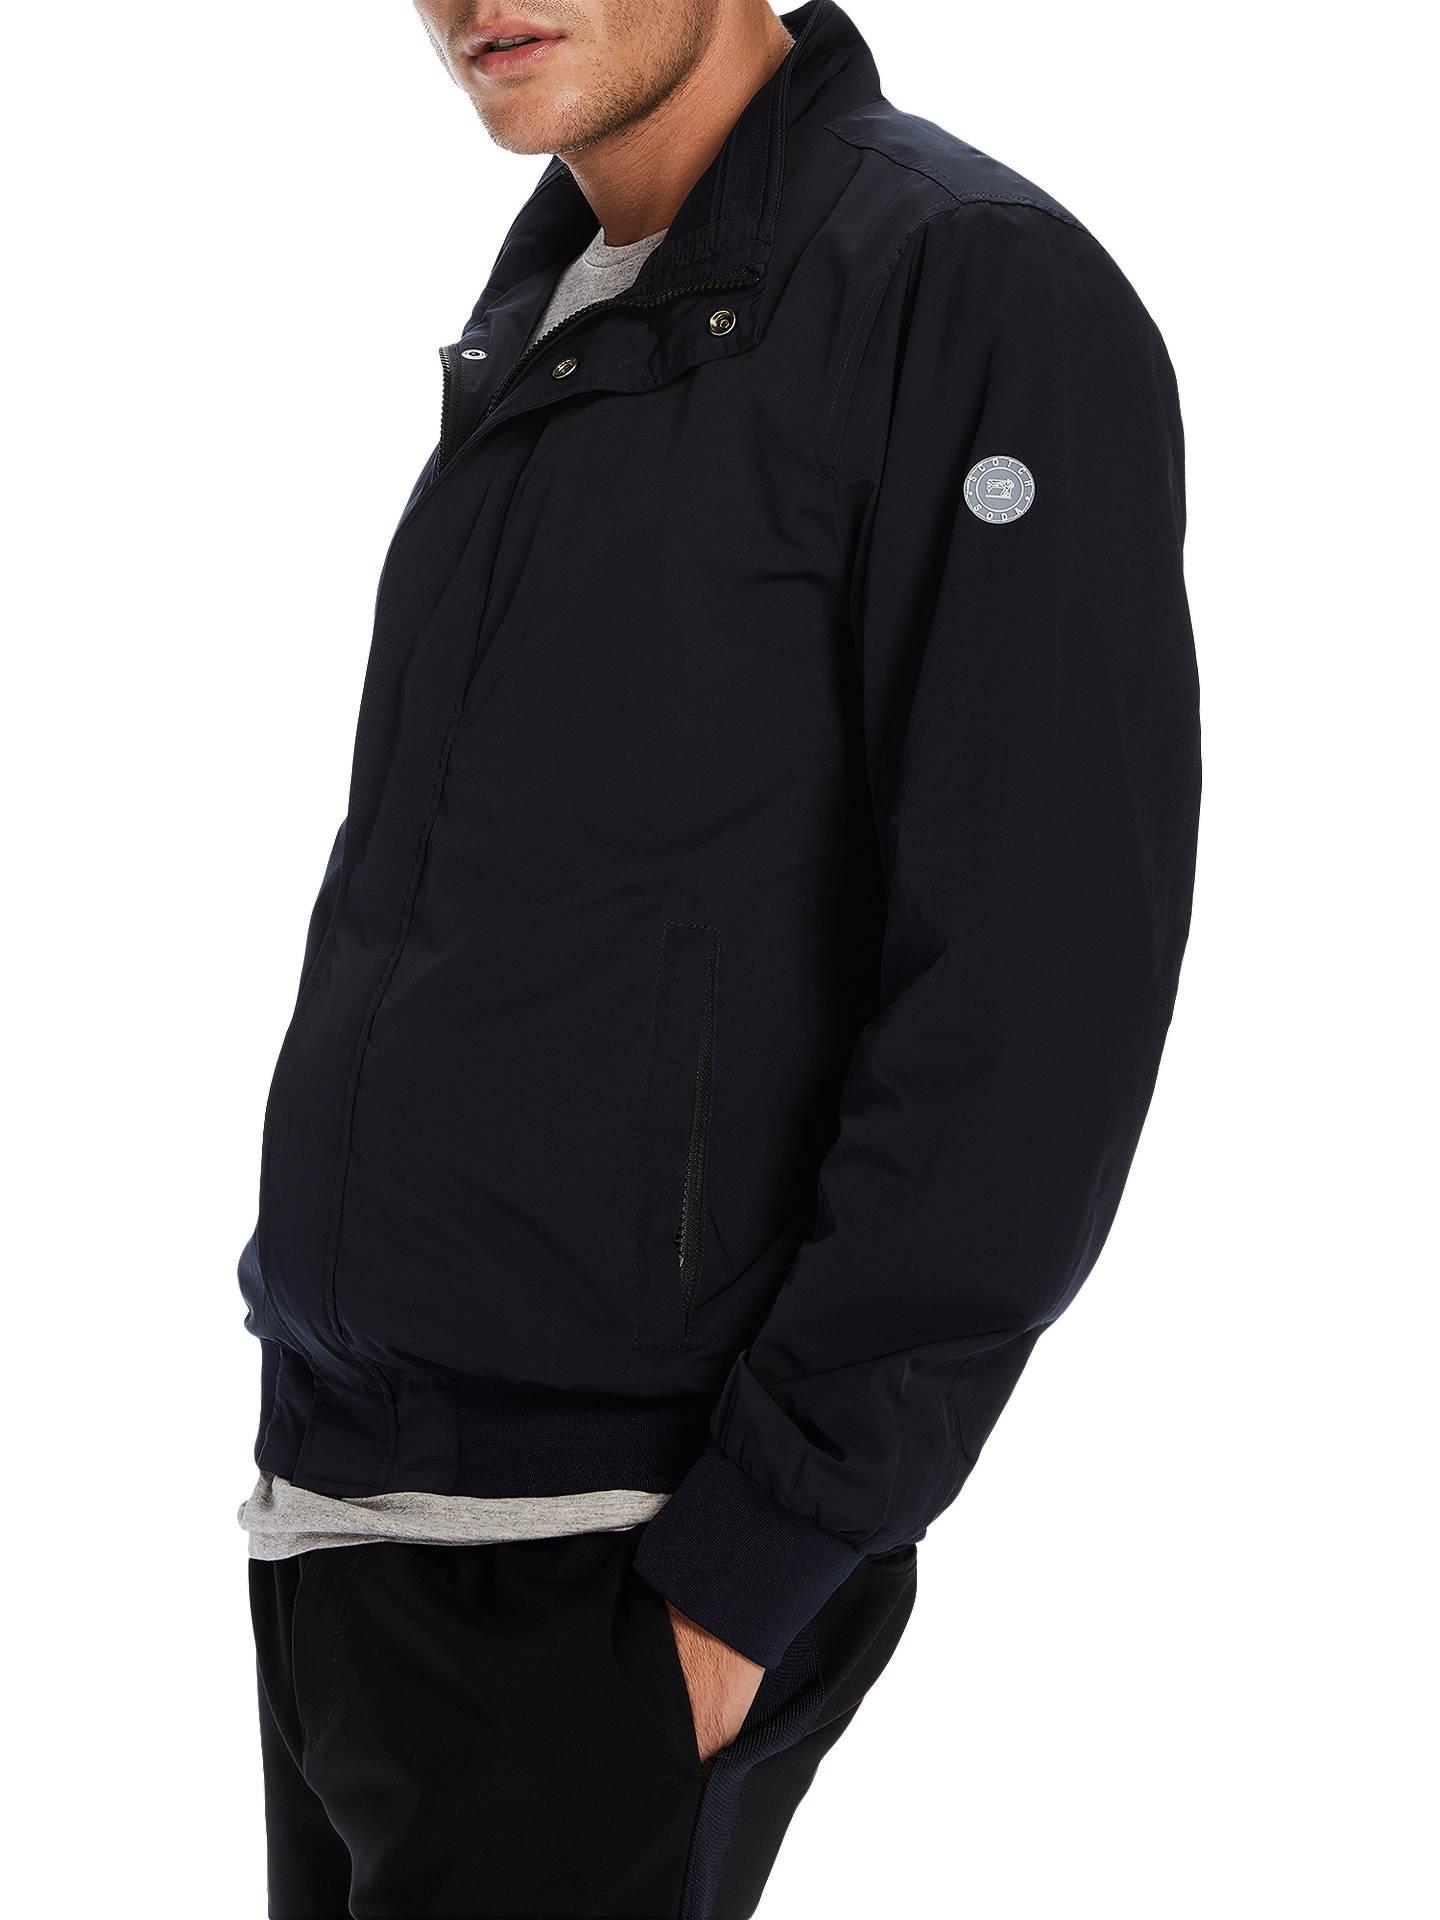 Scotch /& Soda Classic Mens Bomber Jacket